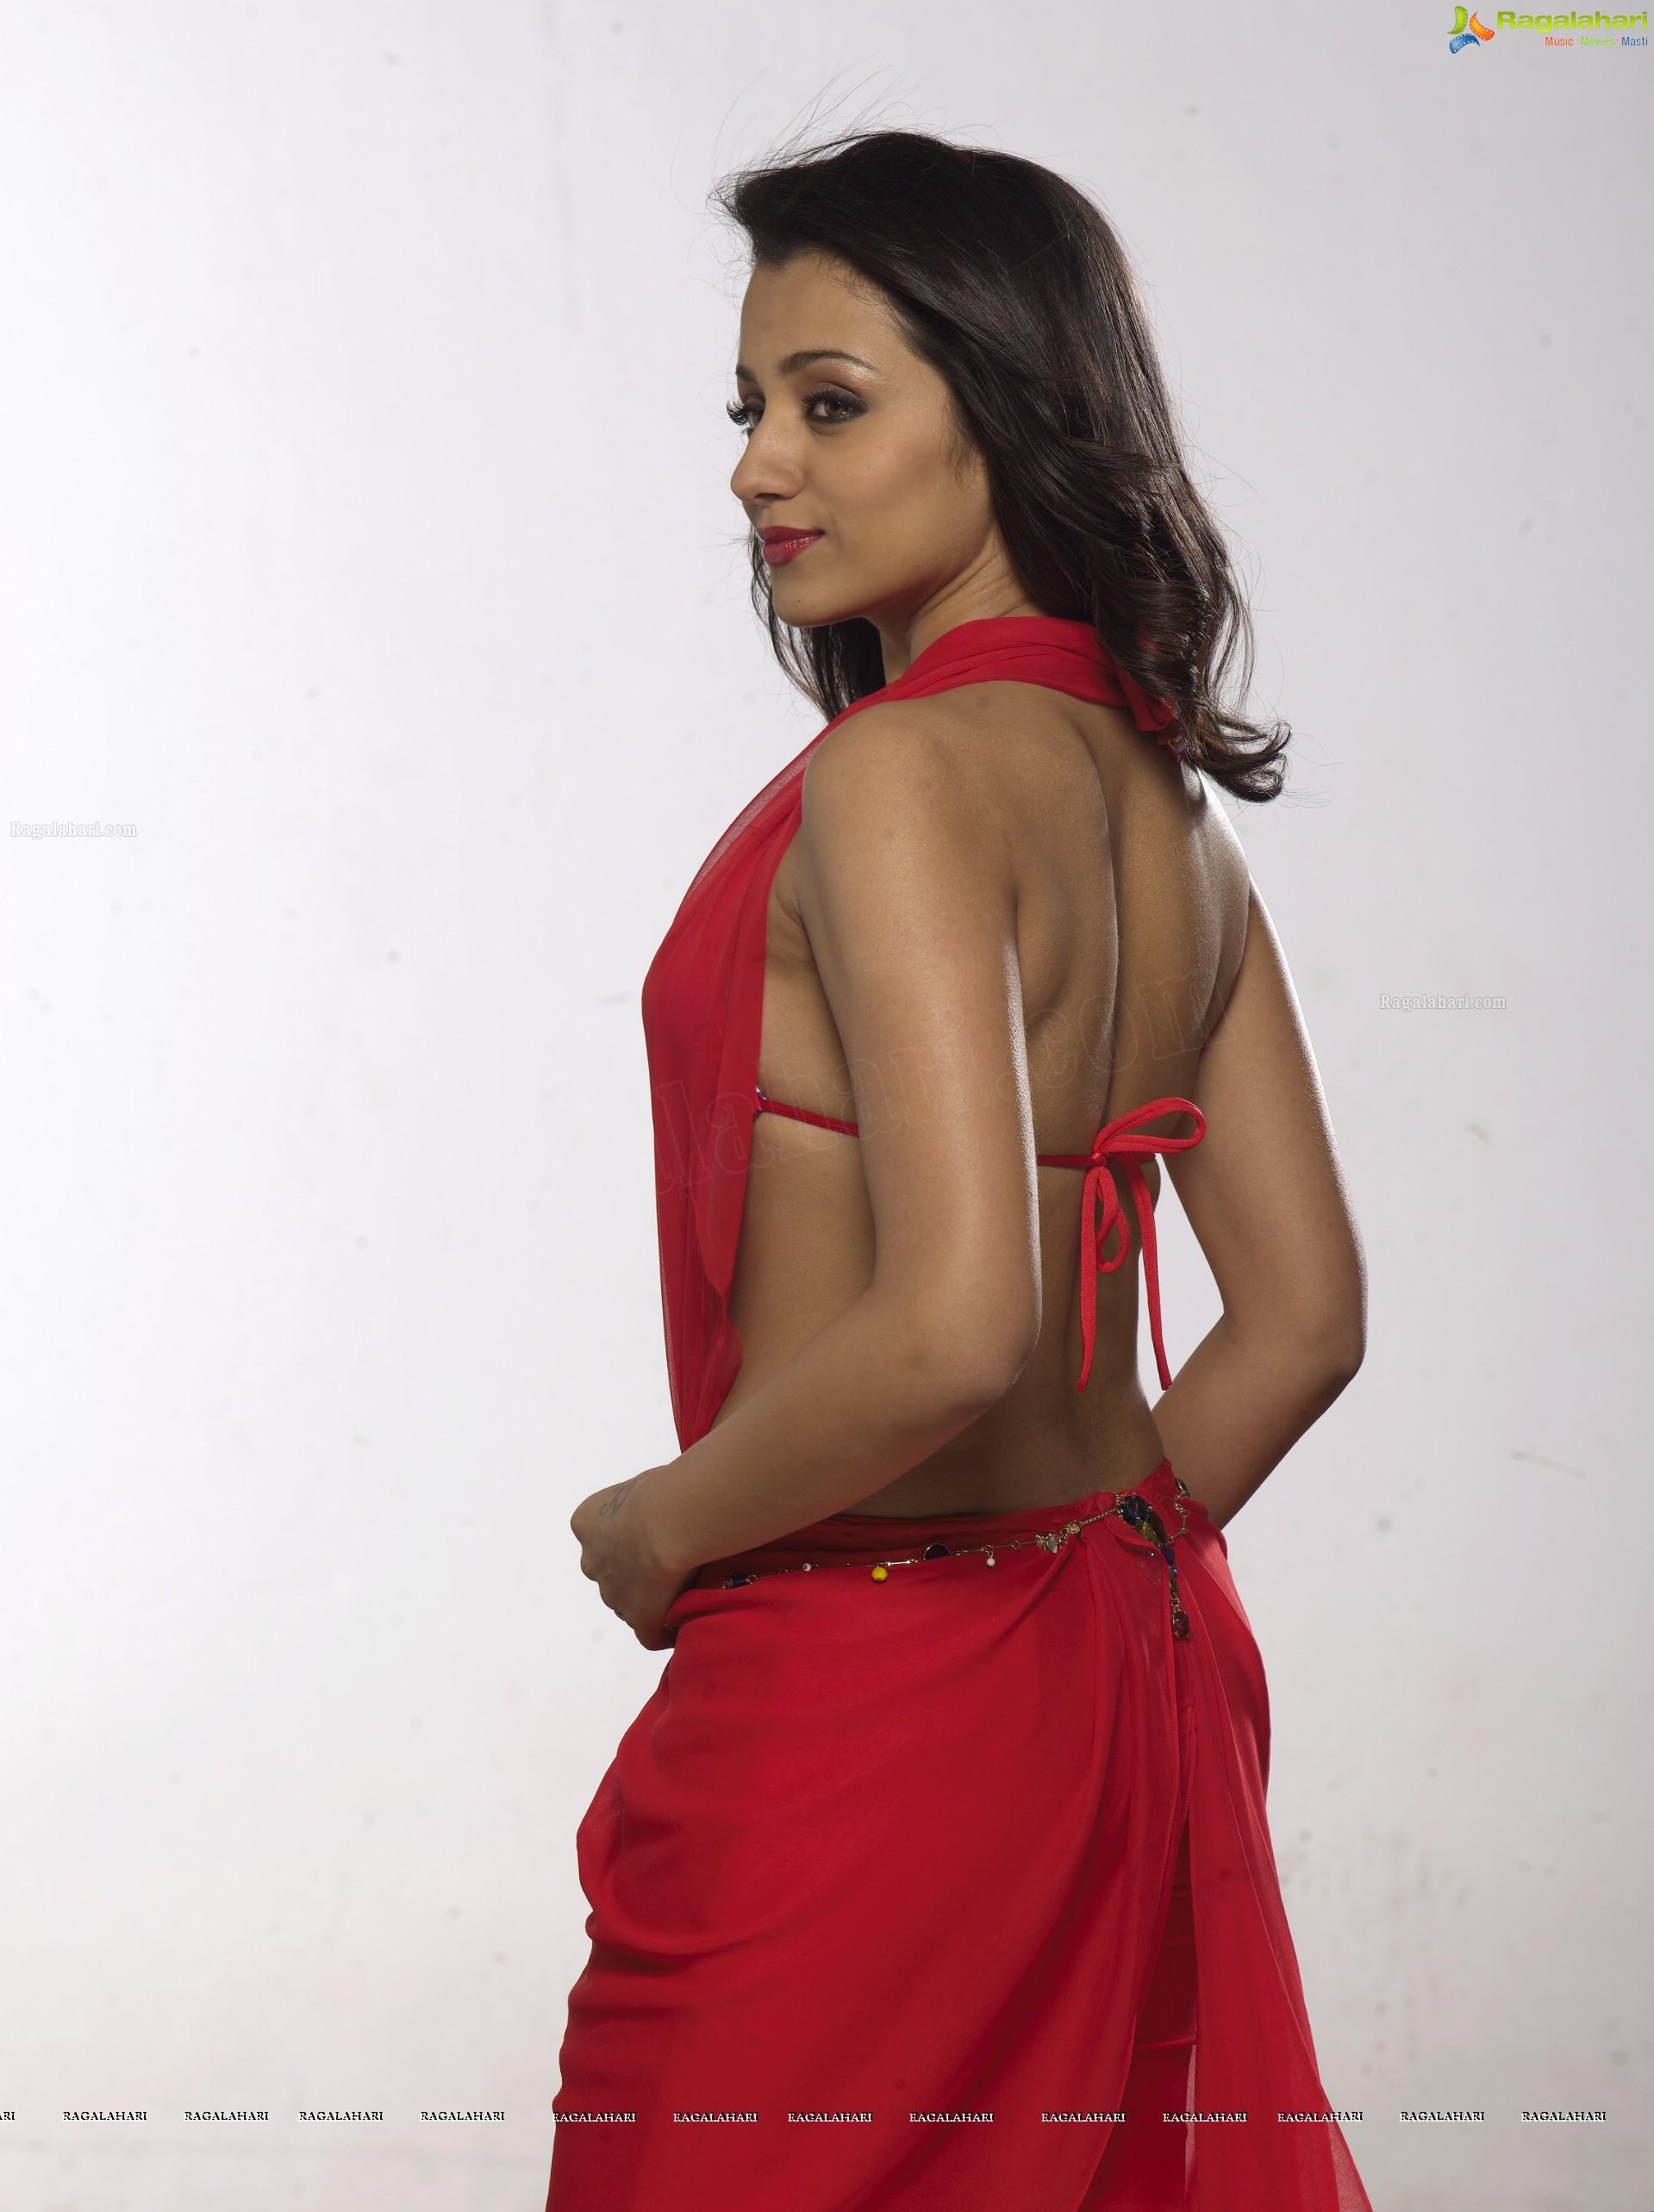 Trisha Red Hot Stills Trisha Red Hot Stills